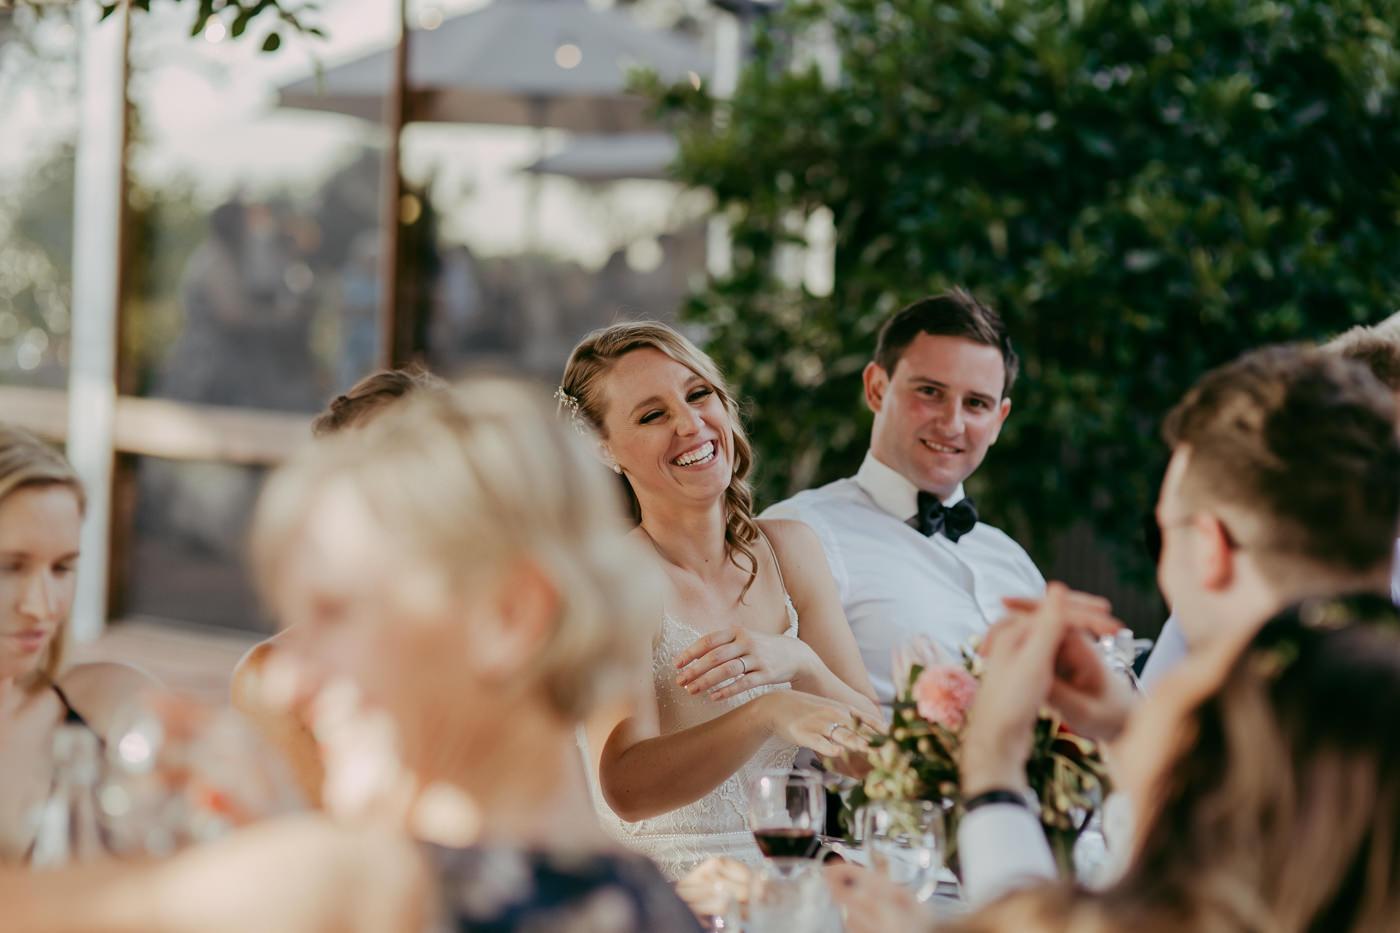 Anthony & Eliet - Wagga Wagga Wedding - Country NSW - Samantha Heather Photography-133.jpg